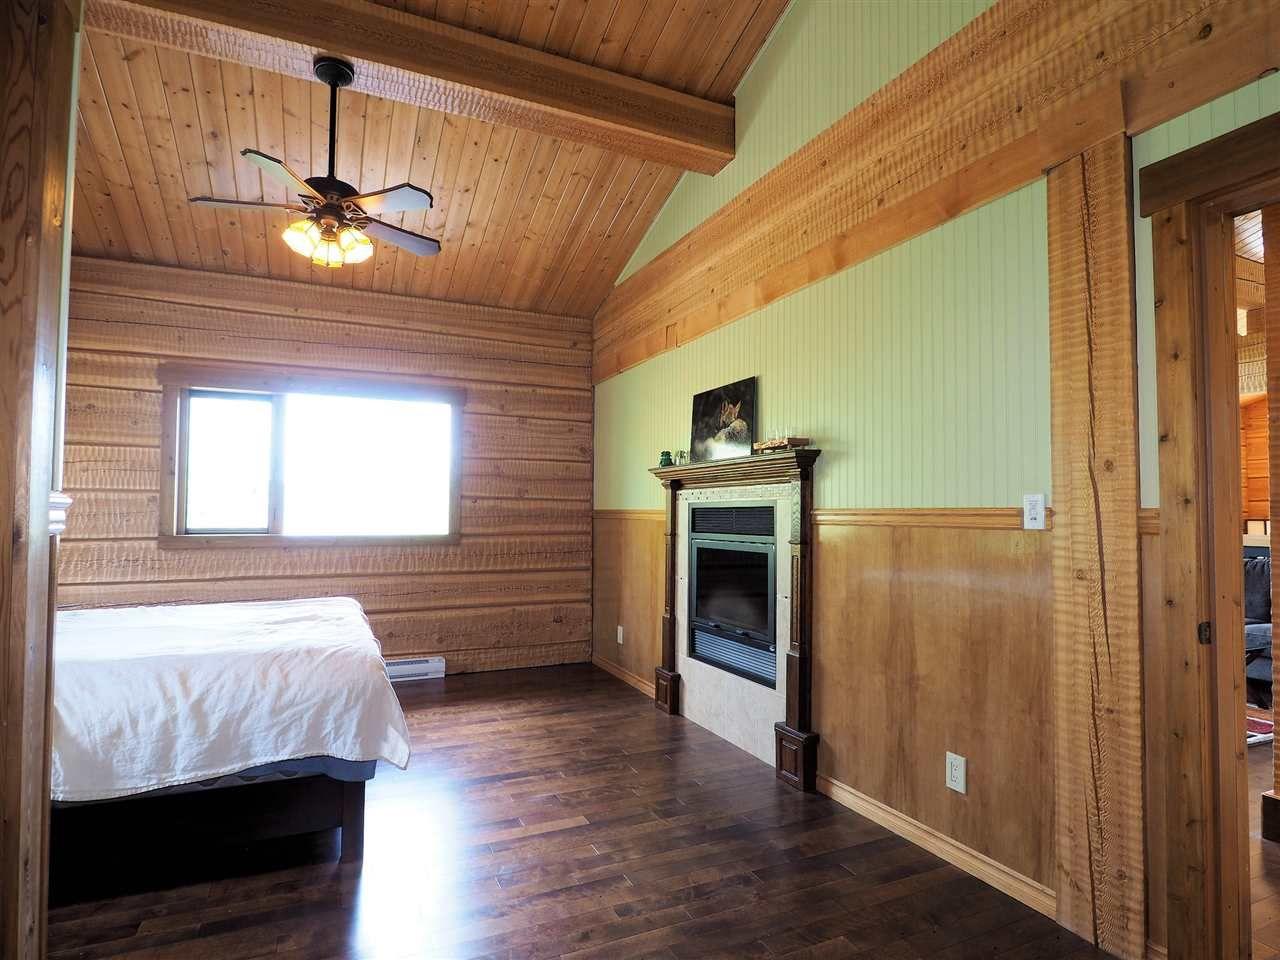 Photo 13: Photos: 4050 CANIM-HENDRIX LAKE Road in Canim Lake: Canim/Mahood Lake House for sale (100 Mile House (Zone 10))  : MLS®# R2396282